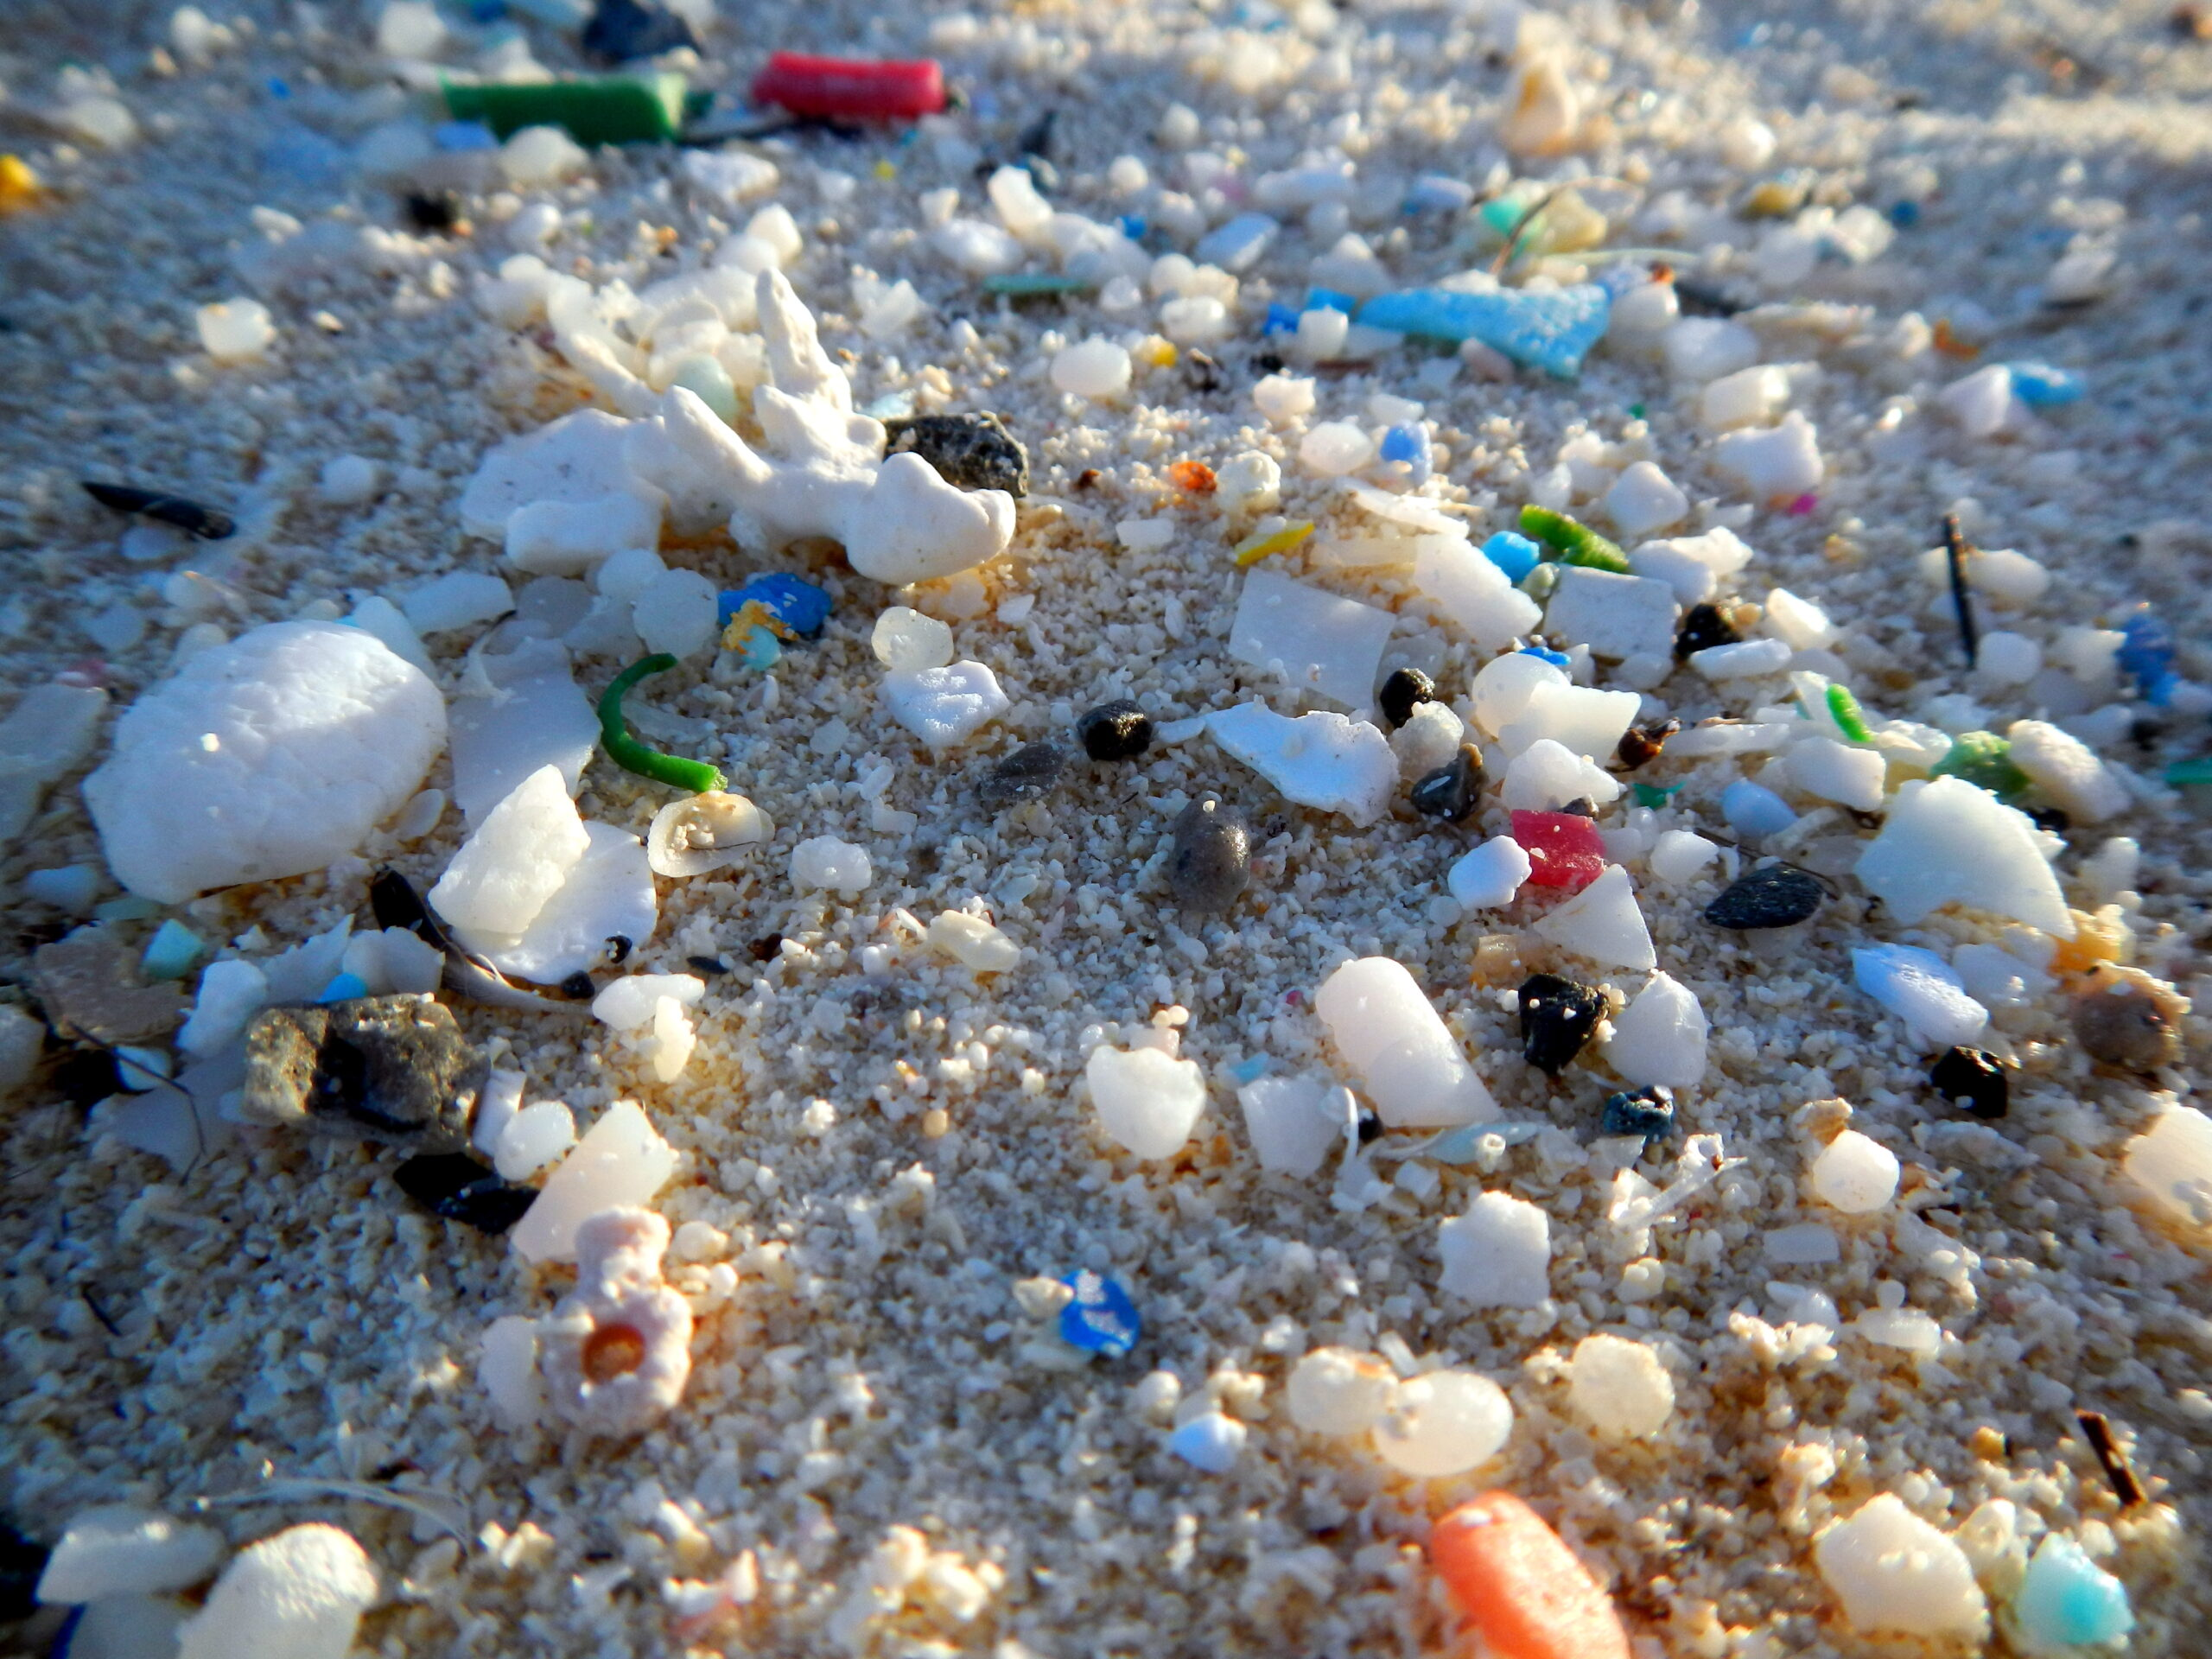 Microplastic Sizes in Hudson-Raritan Estuary and Coastal Ocean Revealed